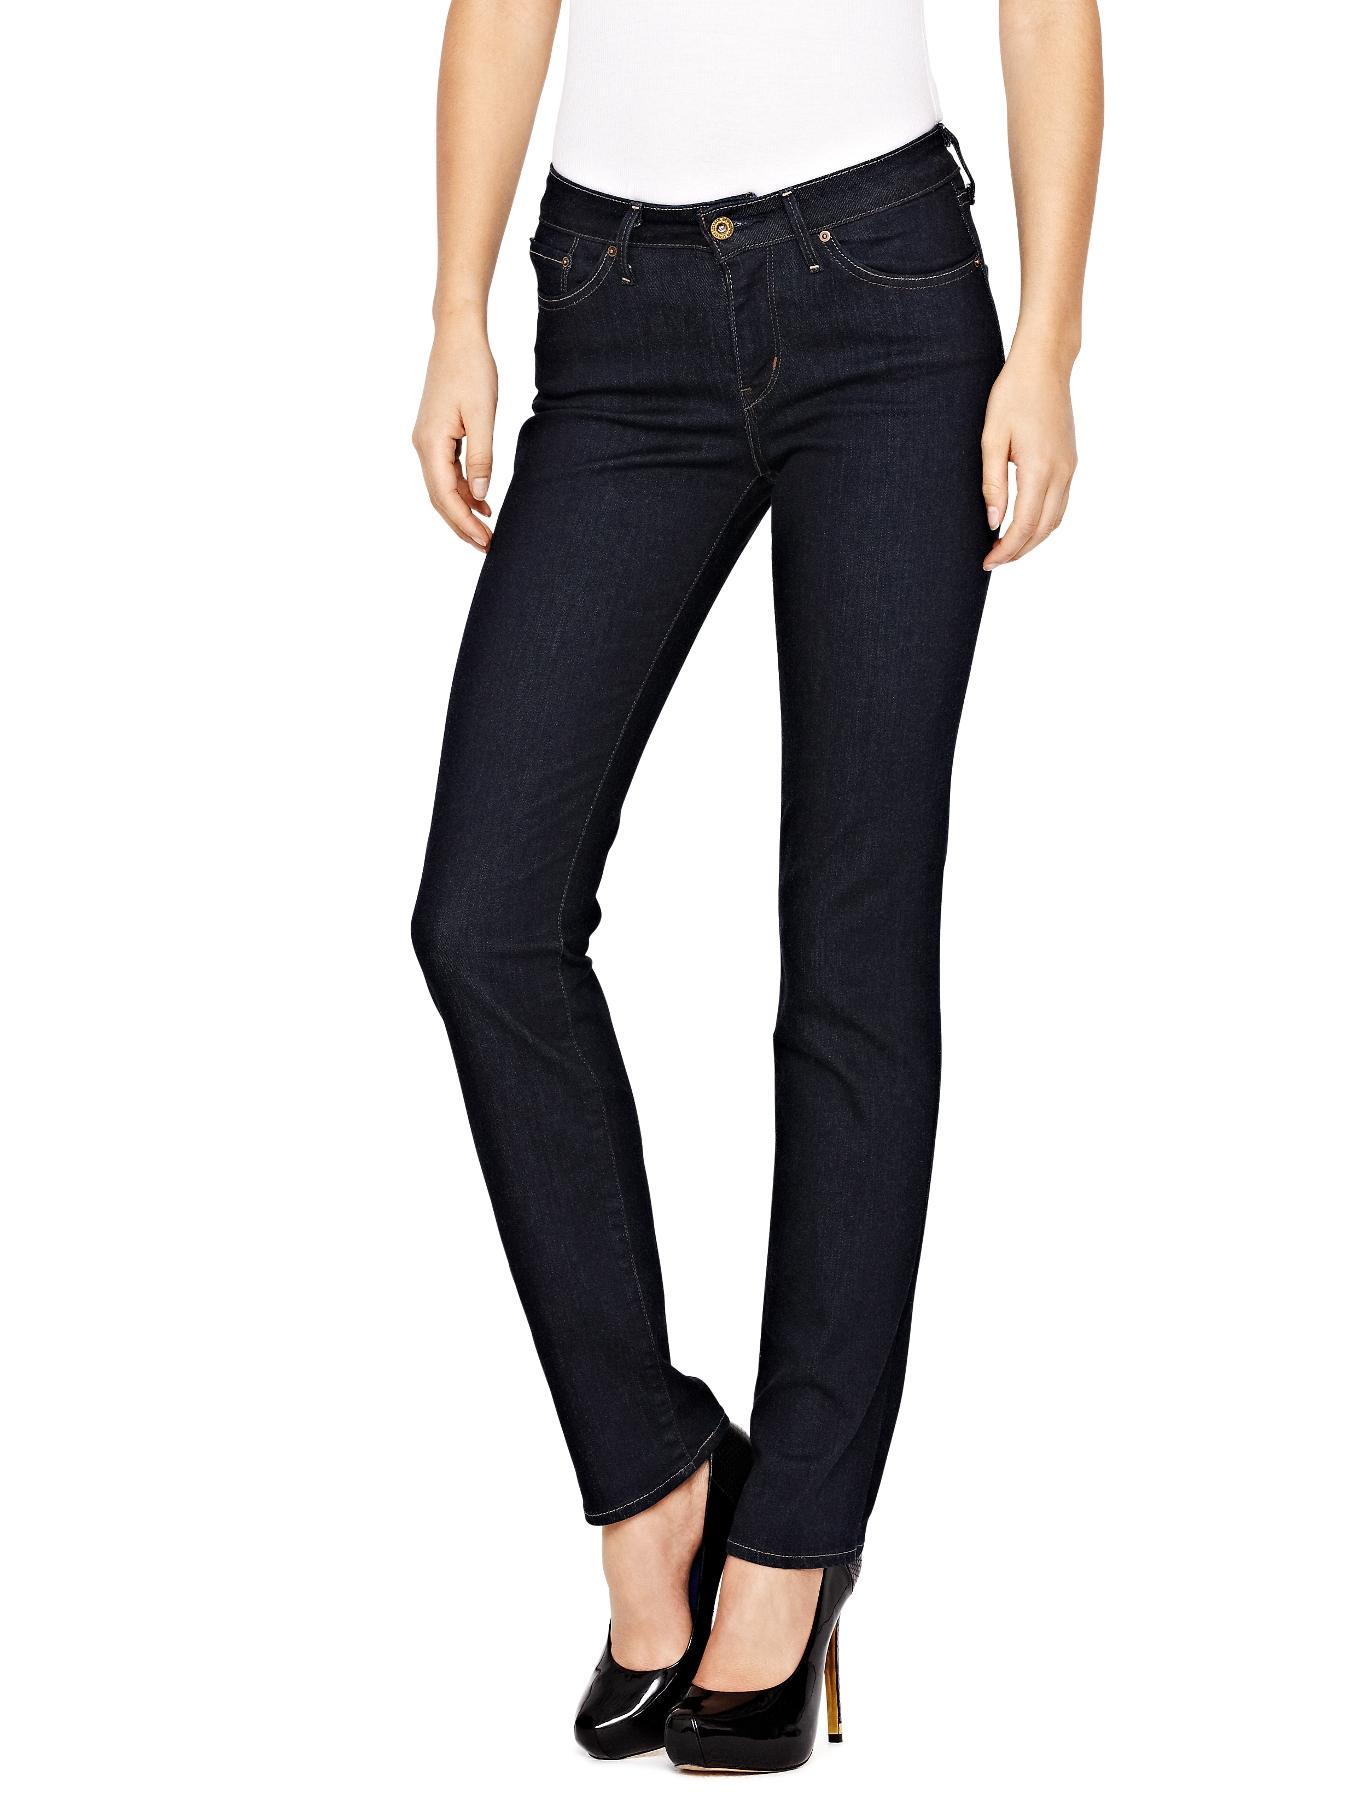 Bold Curve Straight Leg Jeans - Richest Indigo, Indigo